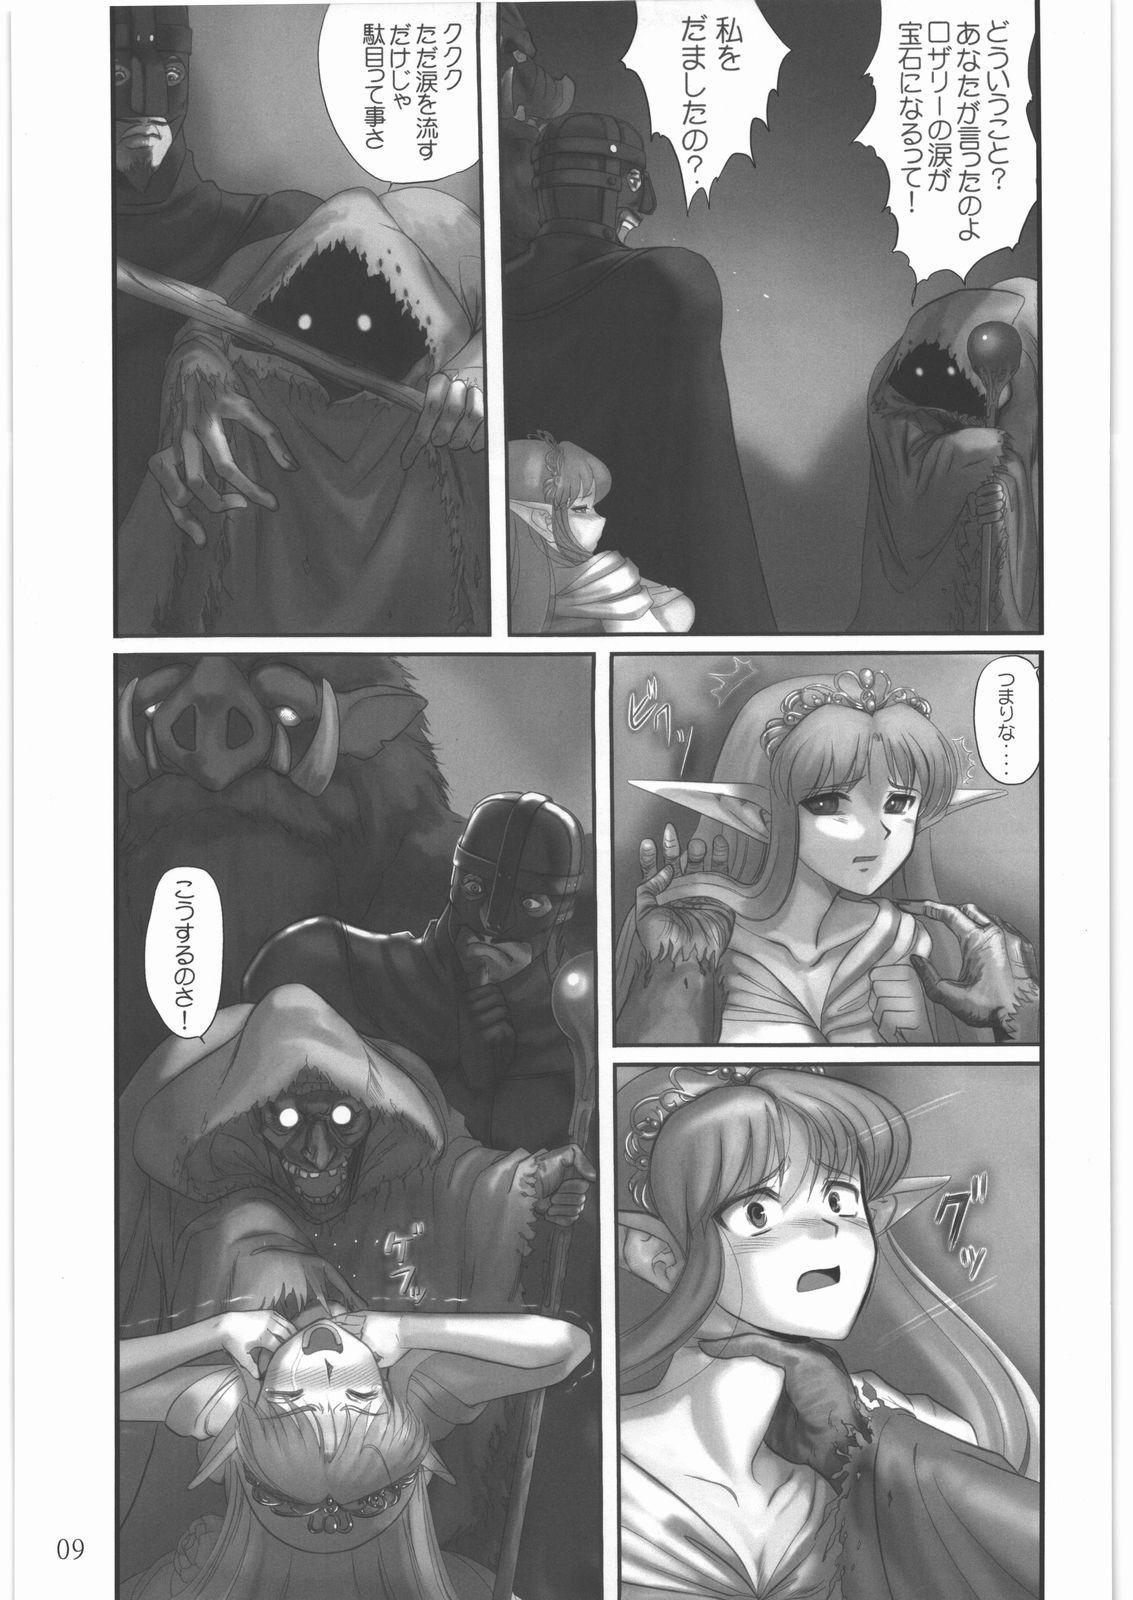 Elf Ryoujoku 7